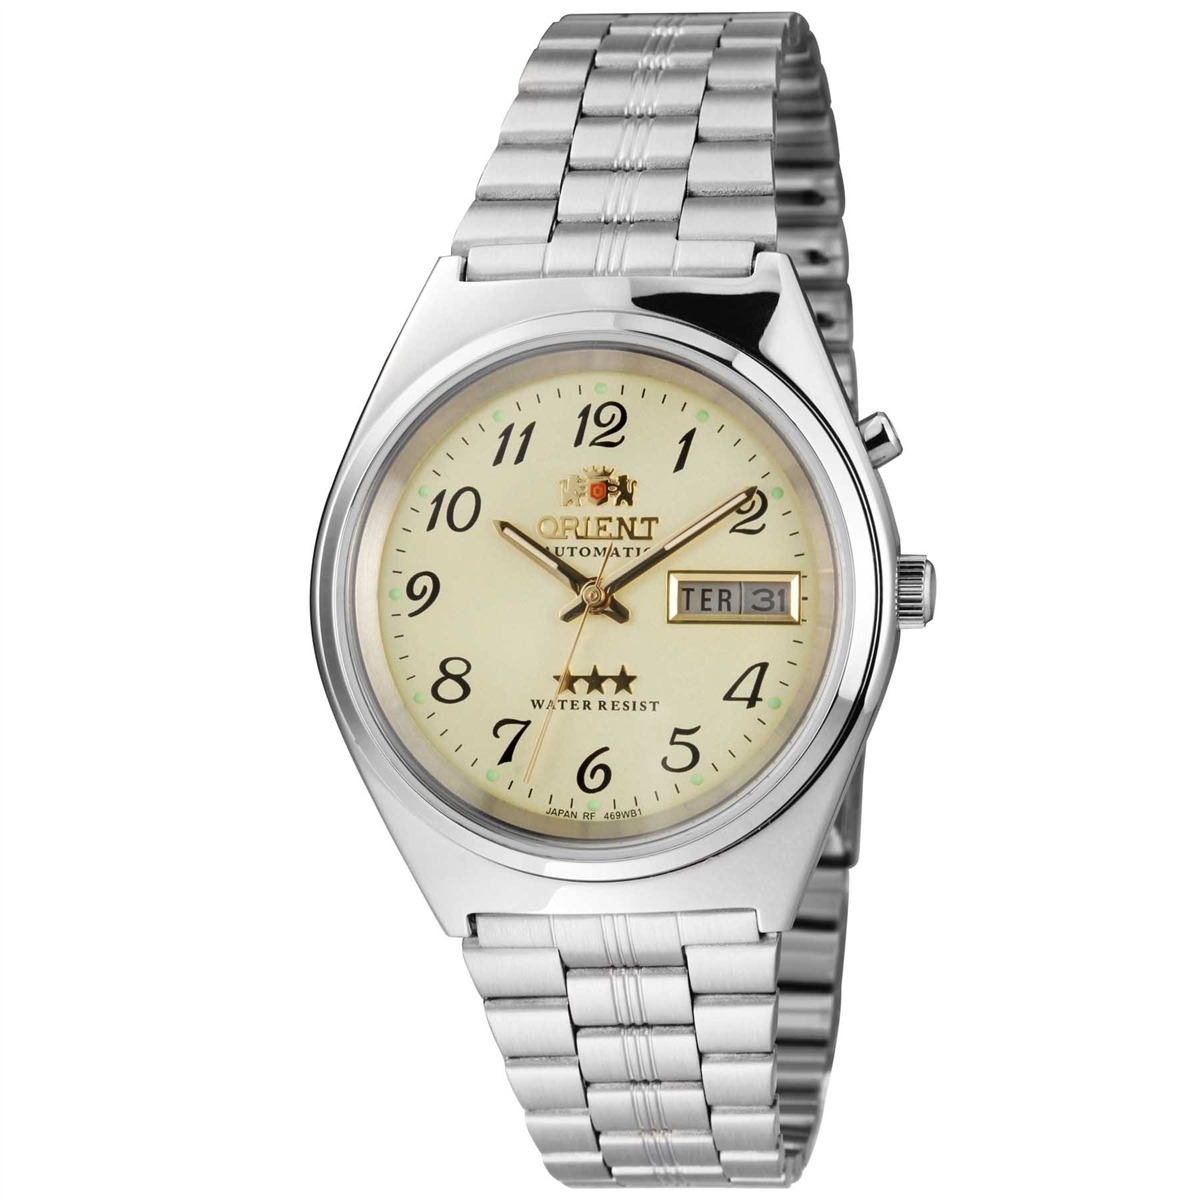 cd98c6513 relógio orient automático analógico classic masculino 469wb1. Carregando  zoom.